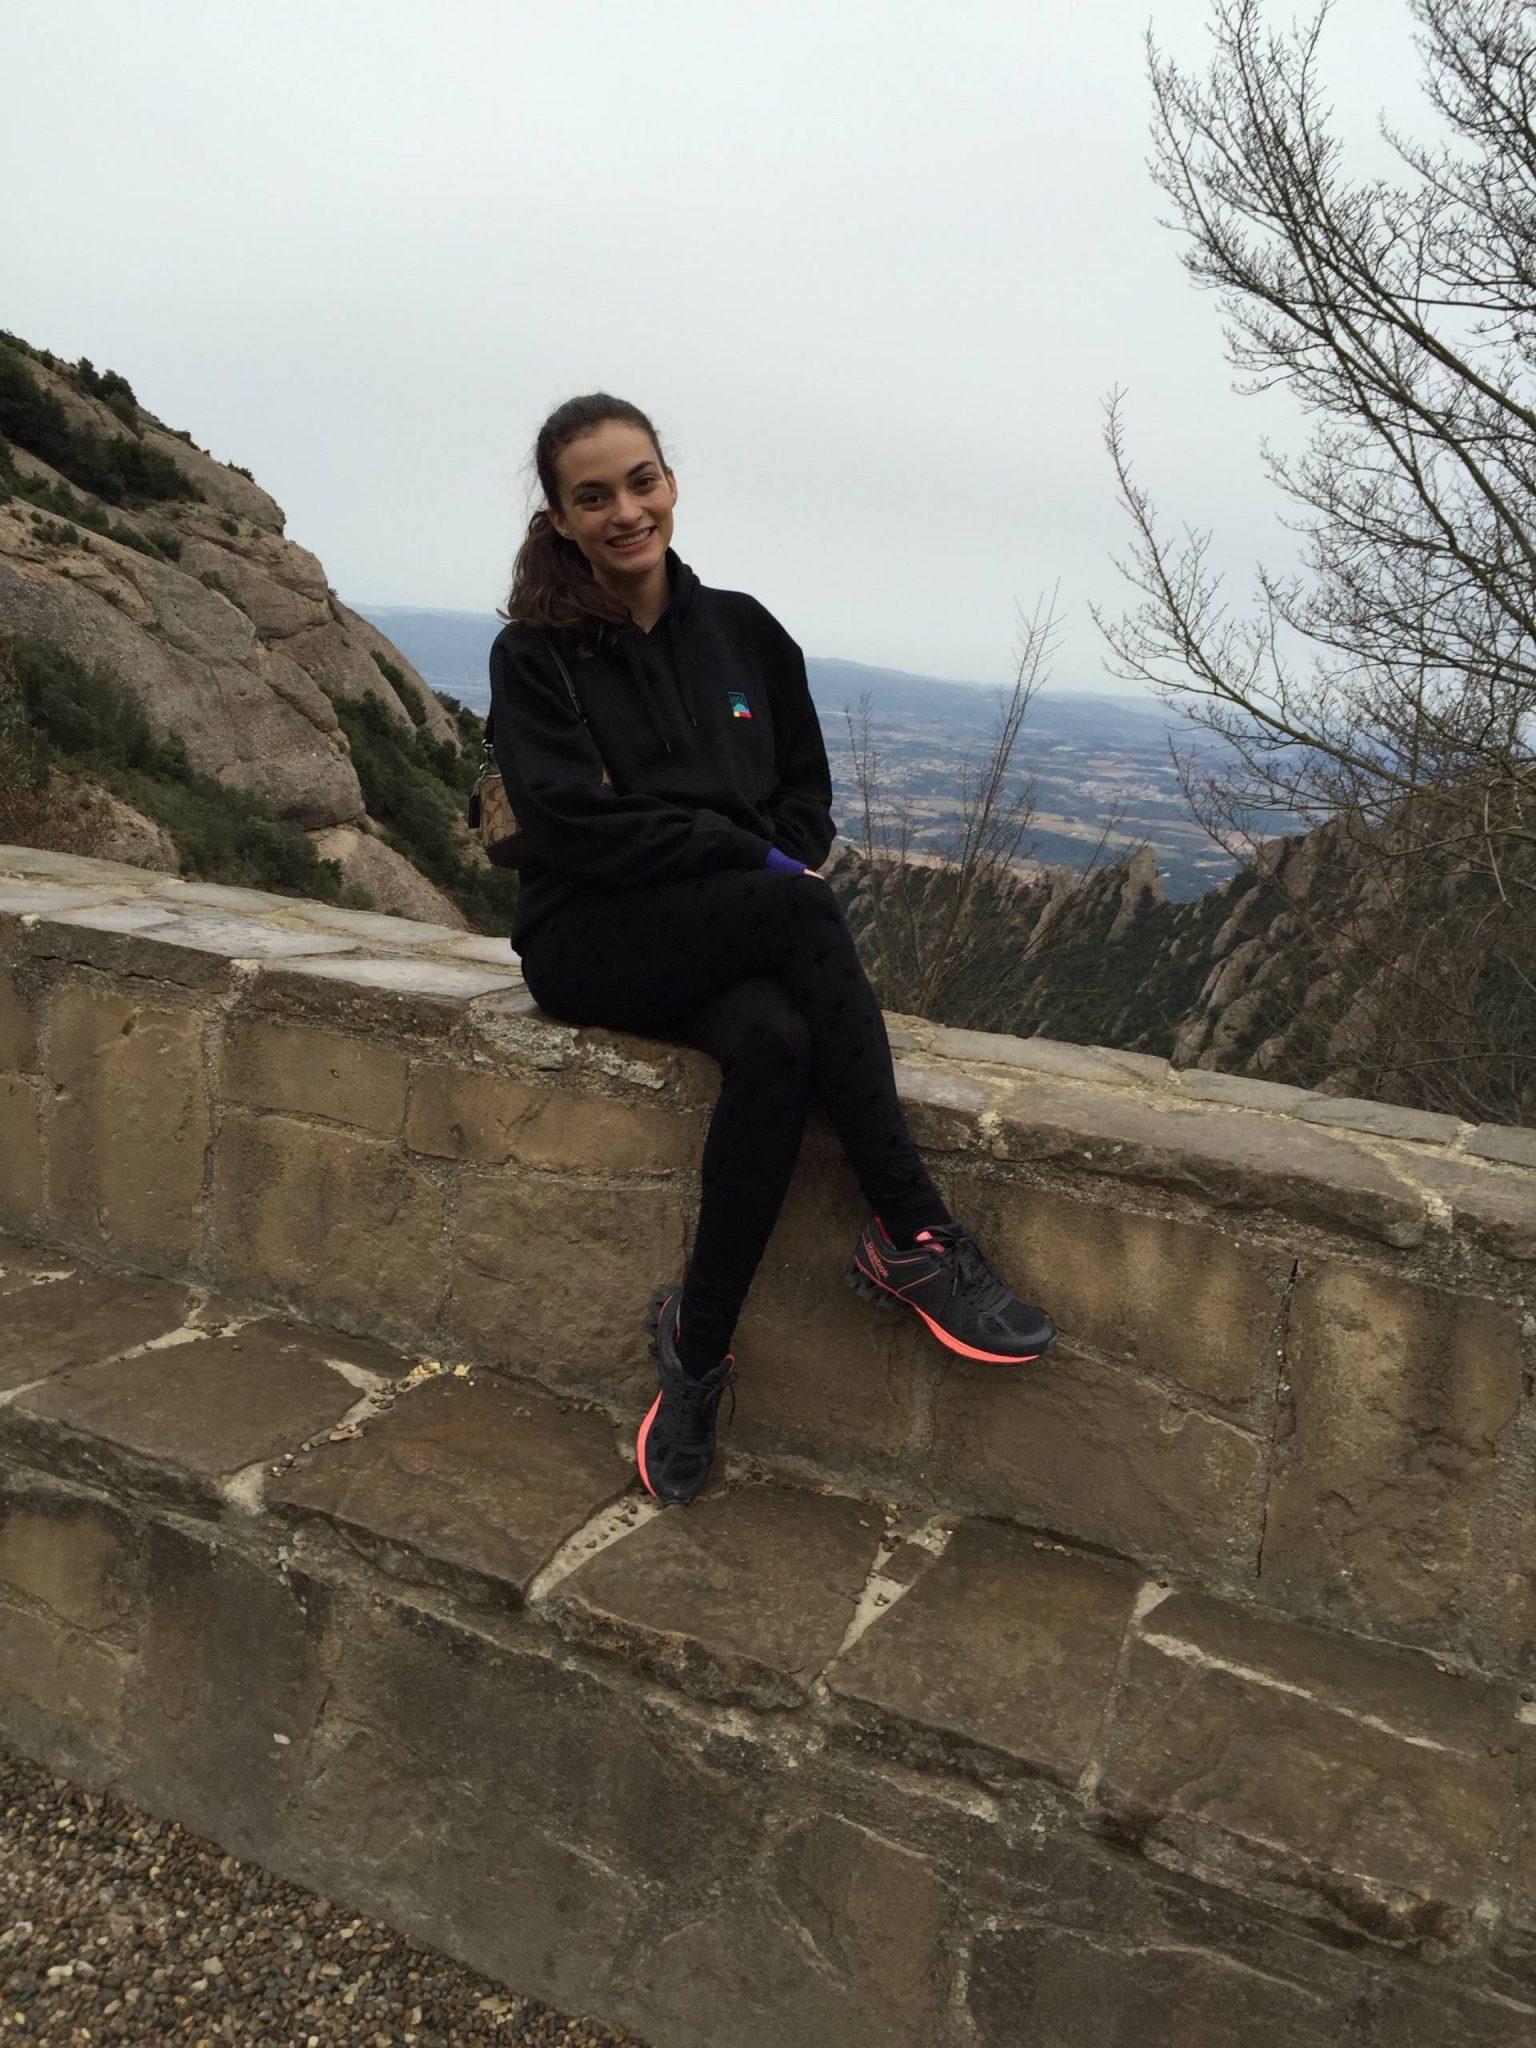 Climbing the Sant Joan trail